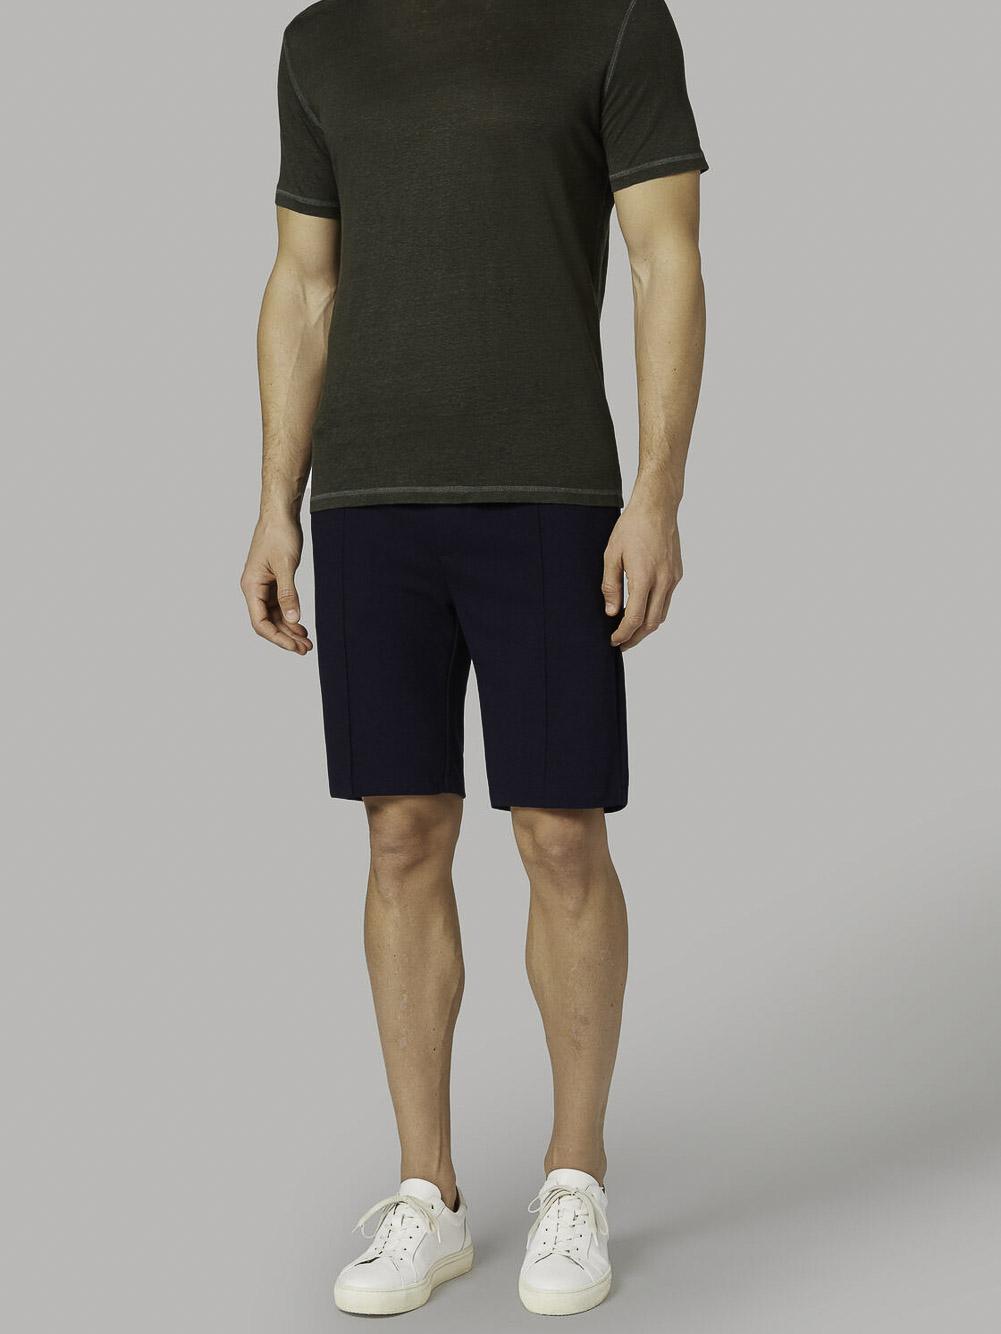 BOGGI Μπλούζα Τ-shirt B021P059405 ΚΥΠΑΡΙΣΙ